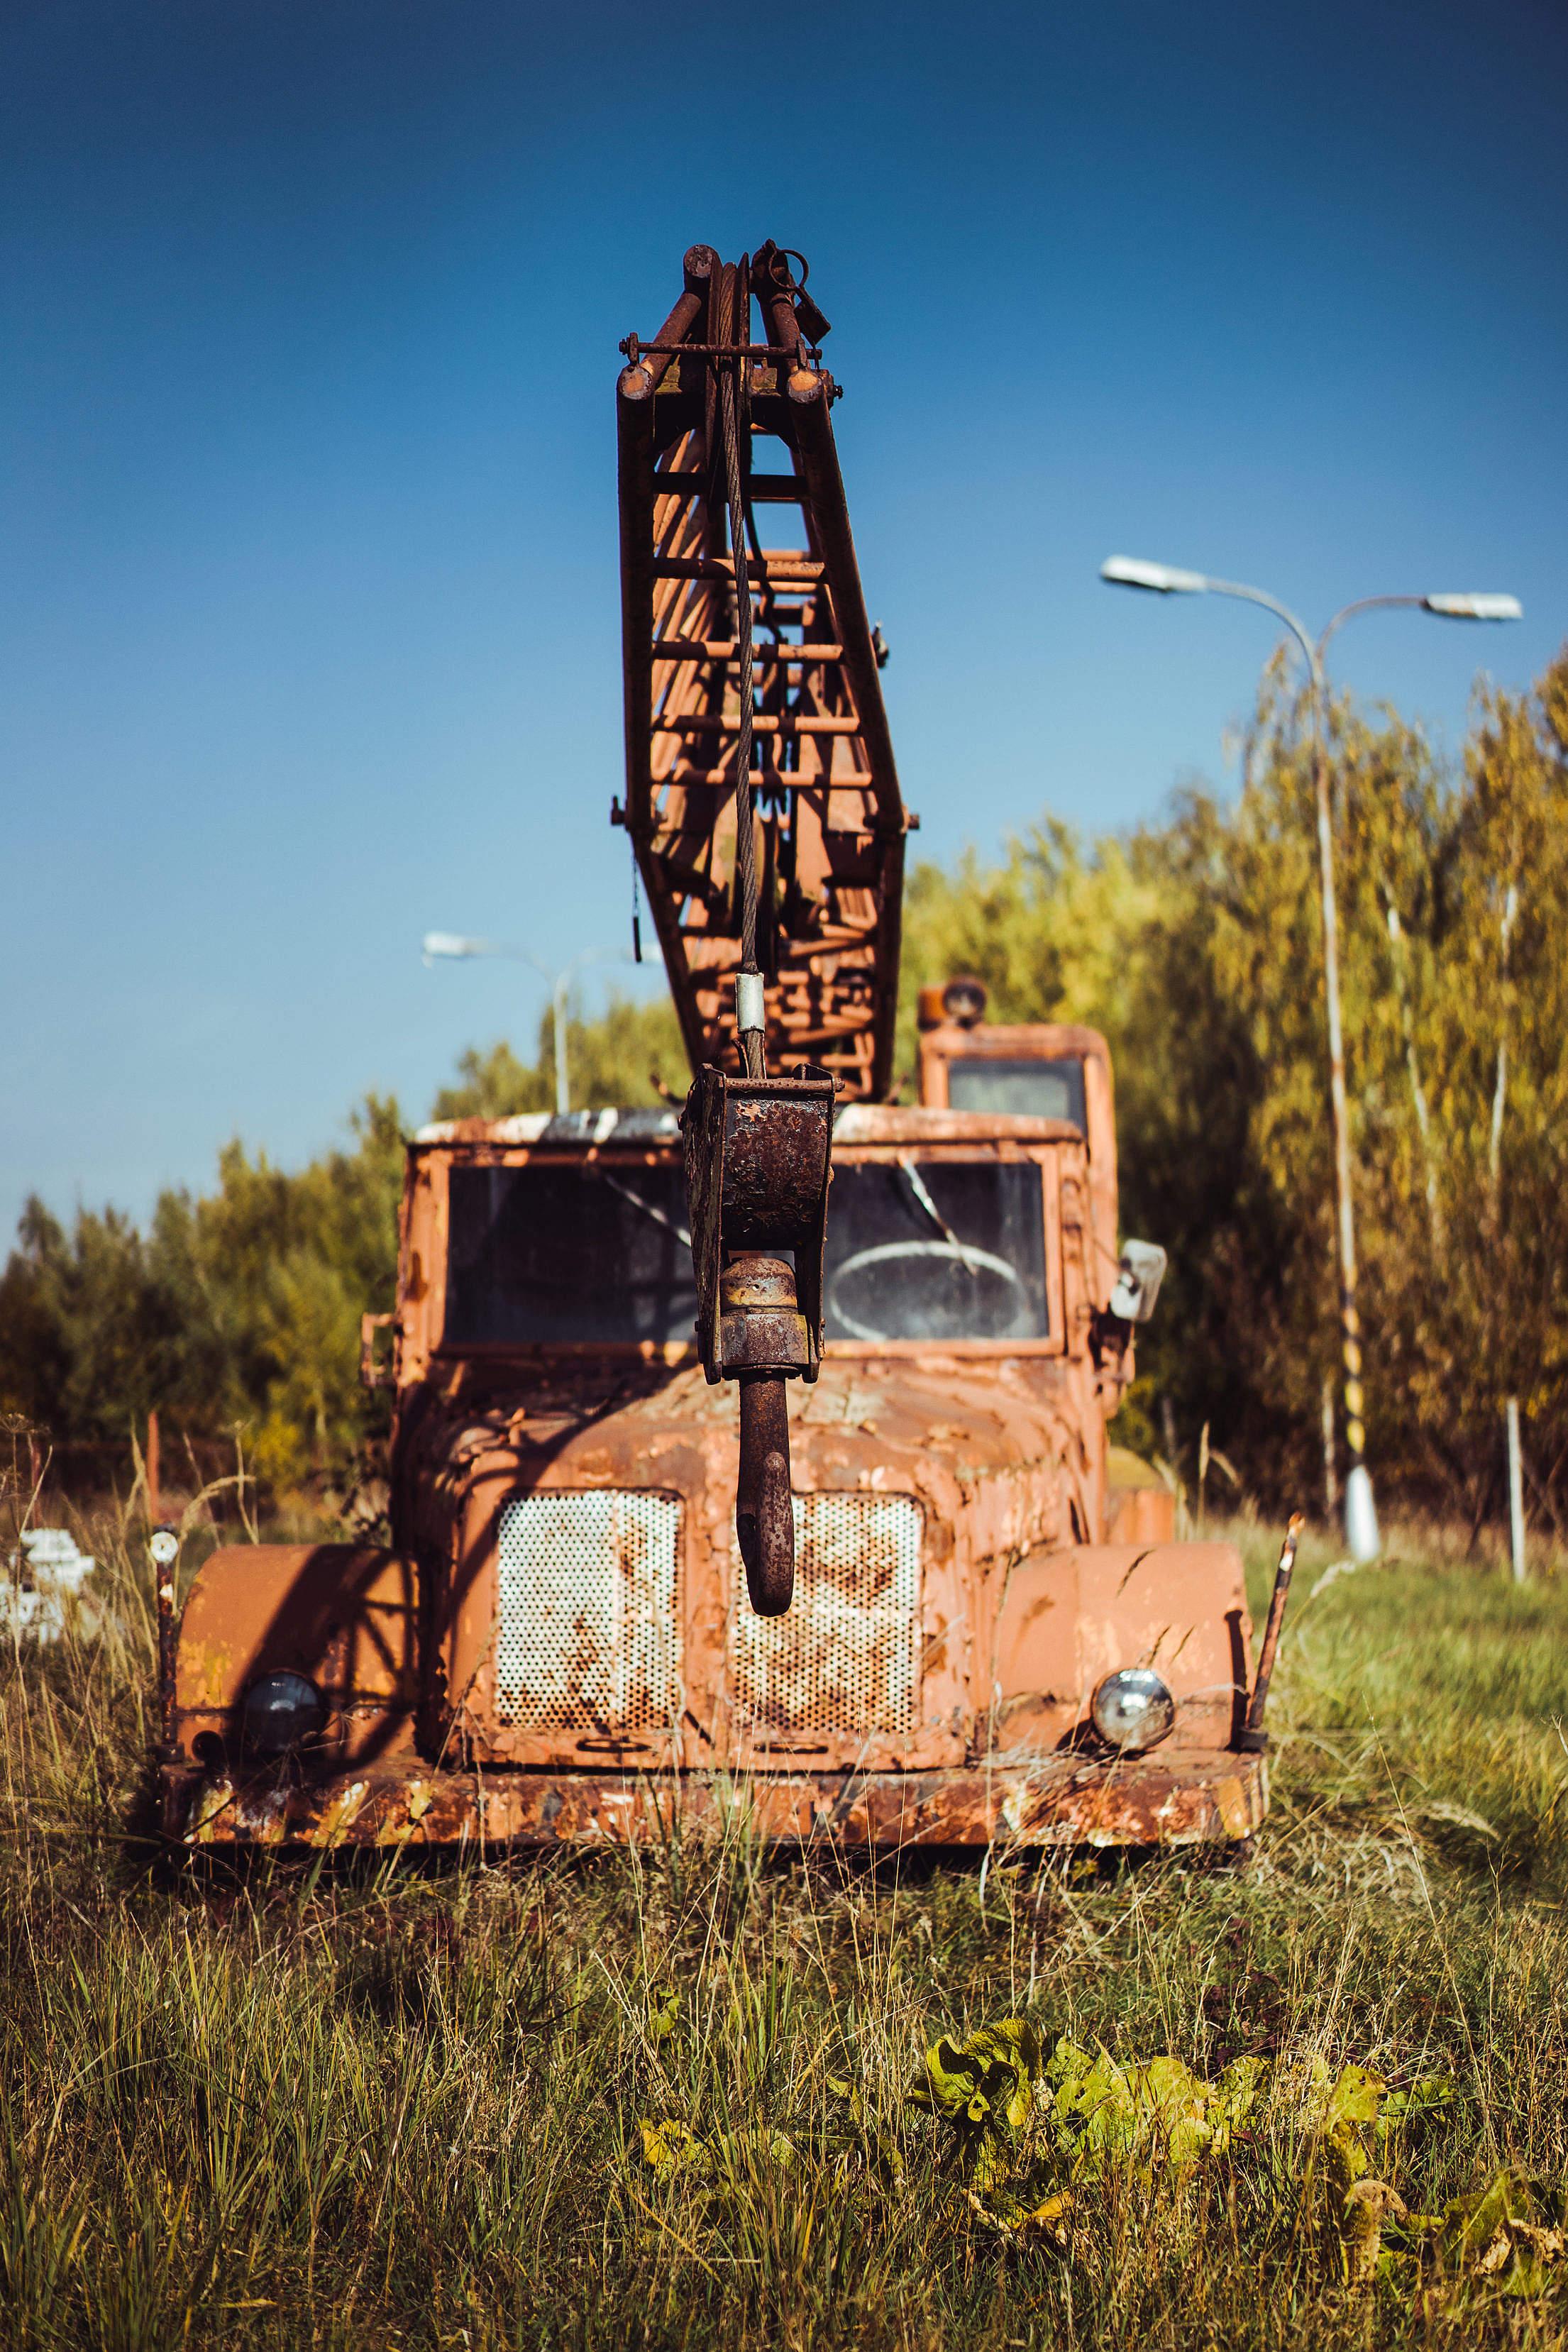 Rusty & Abandoned Crane Truck Free Stock Photo